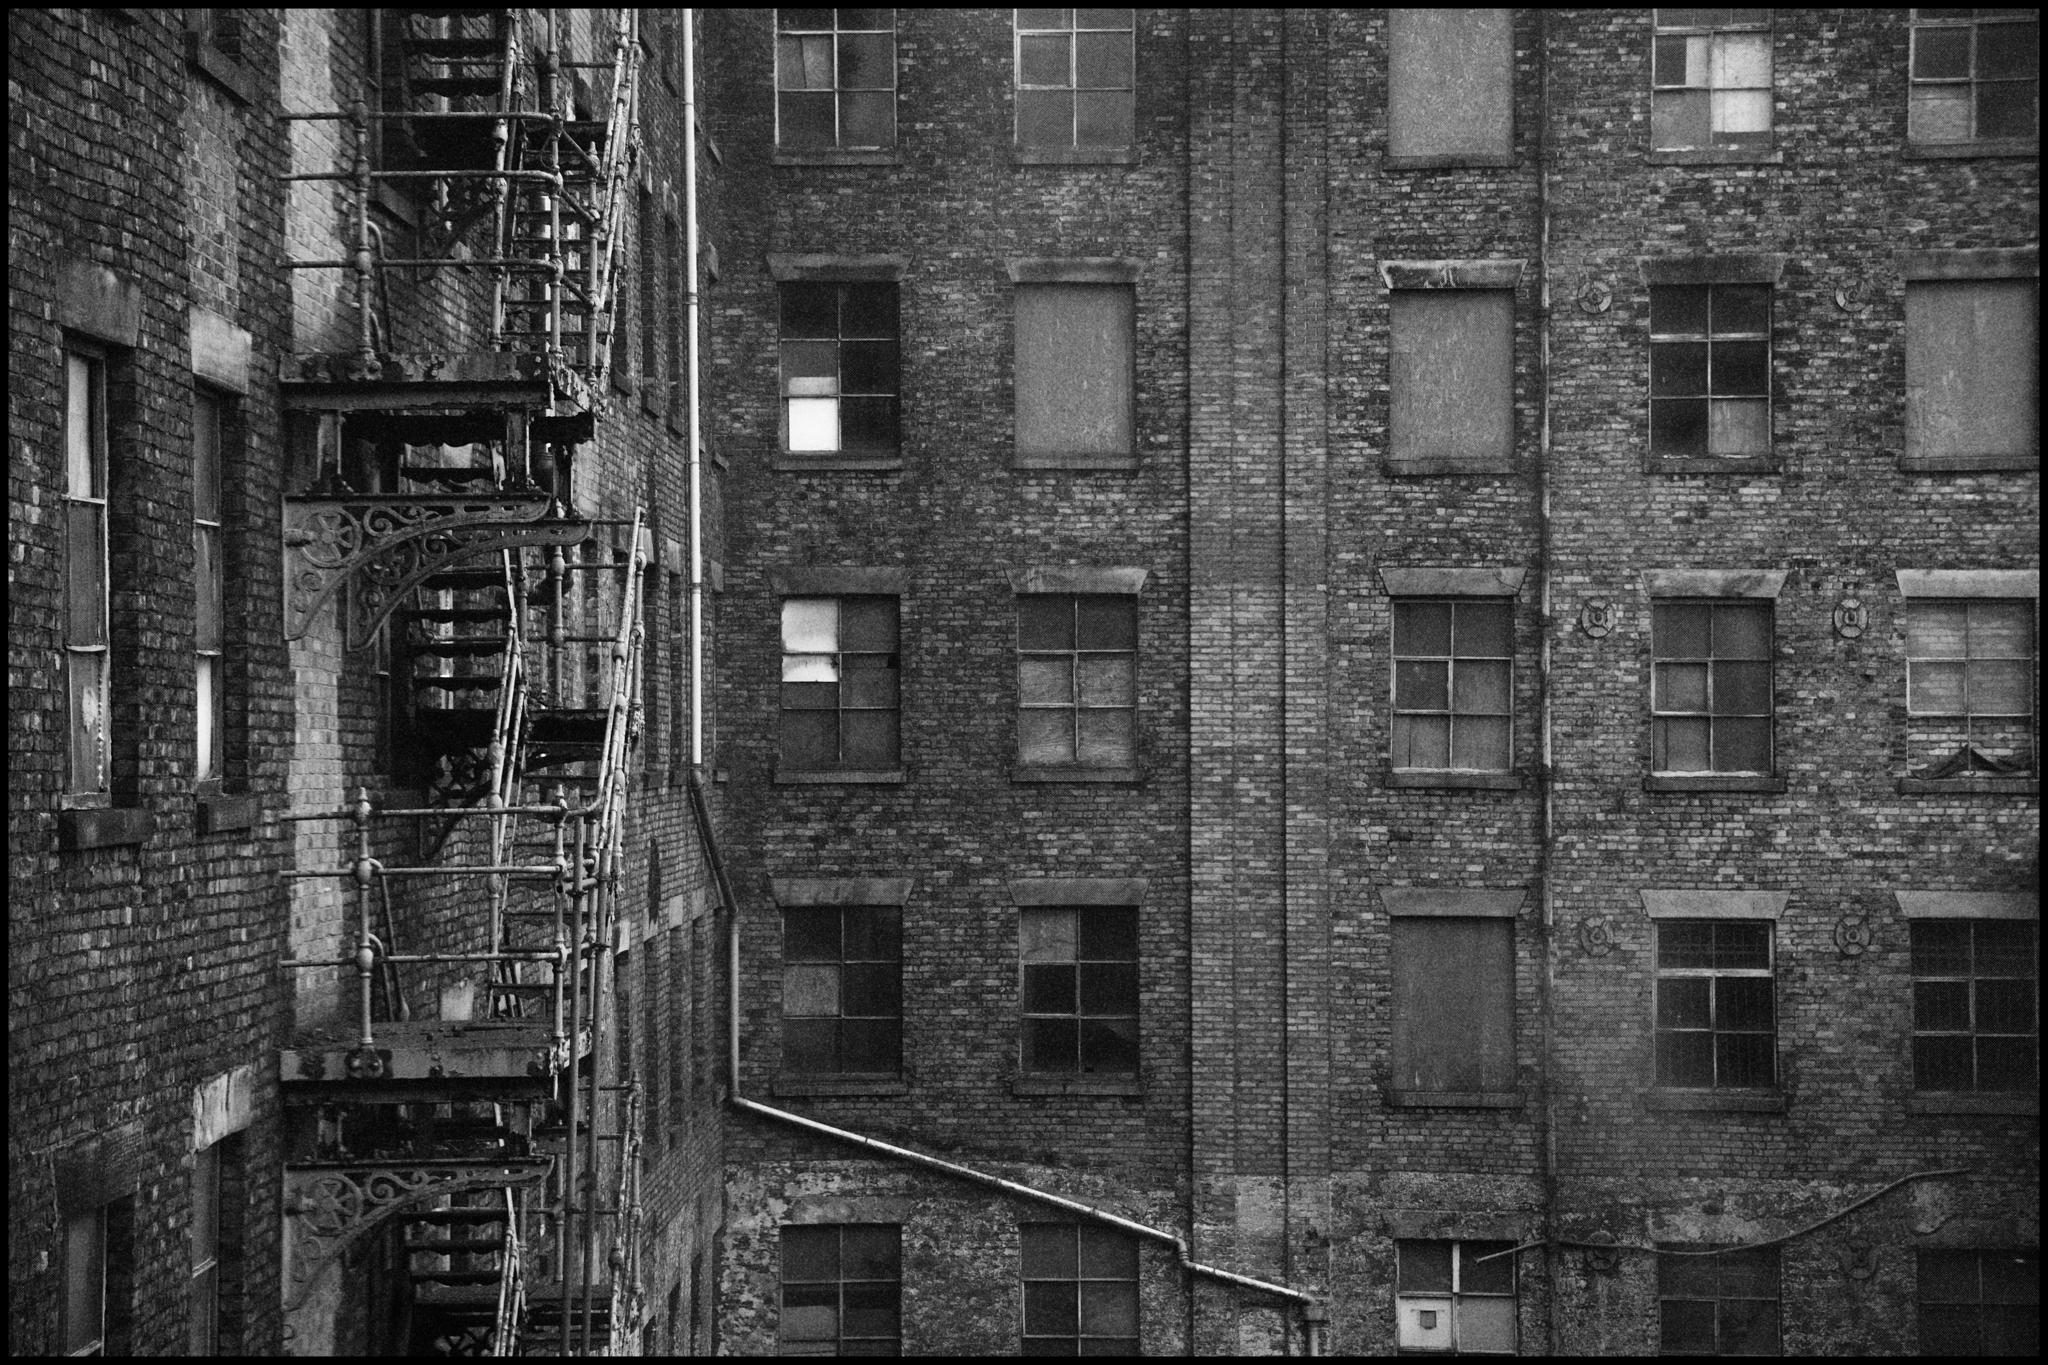 17 June 2019 - Bricks and windows, Manchester UK